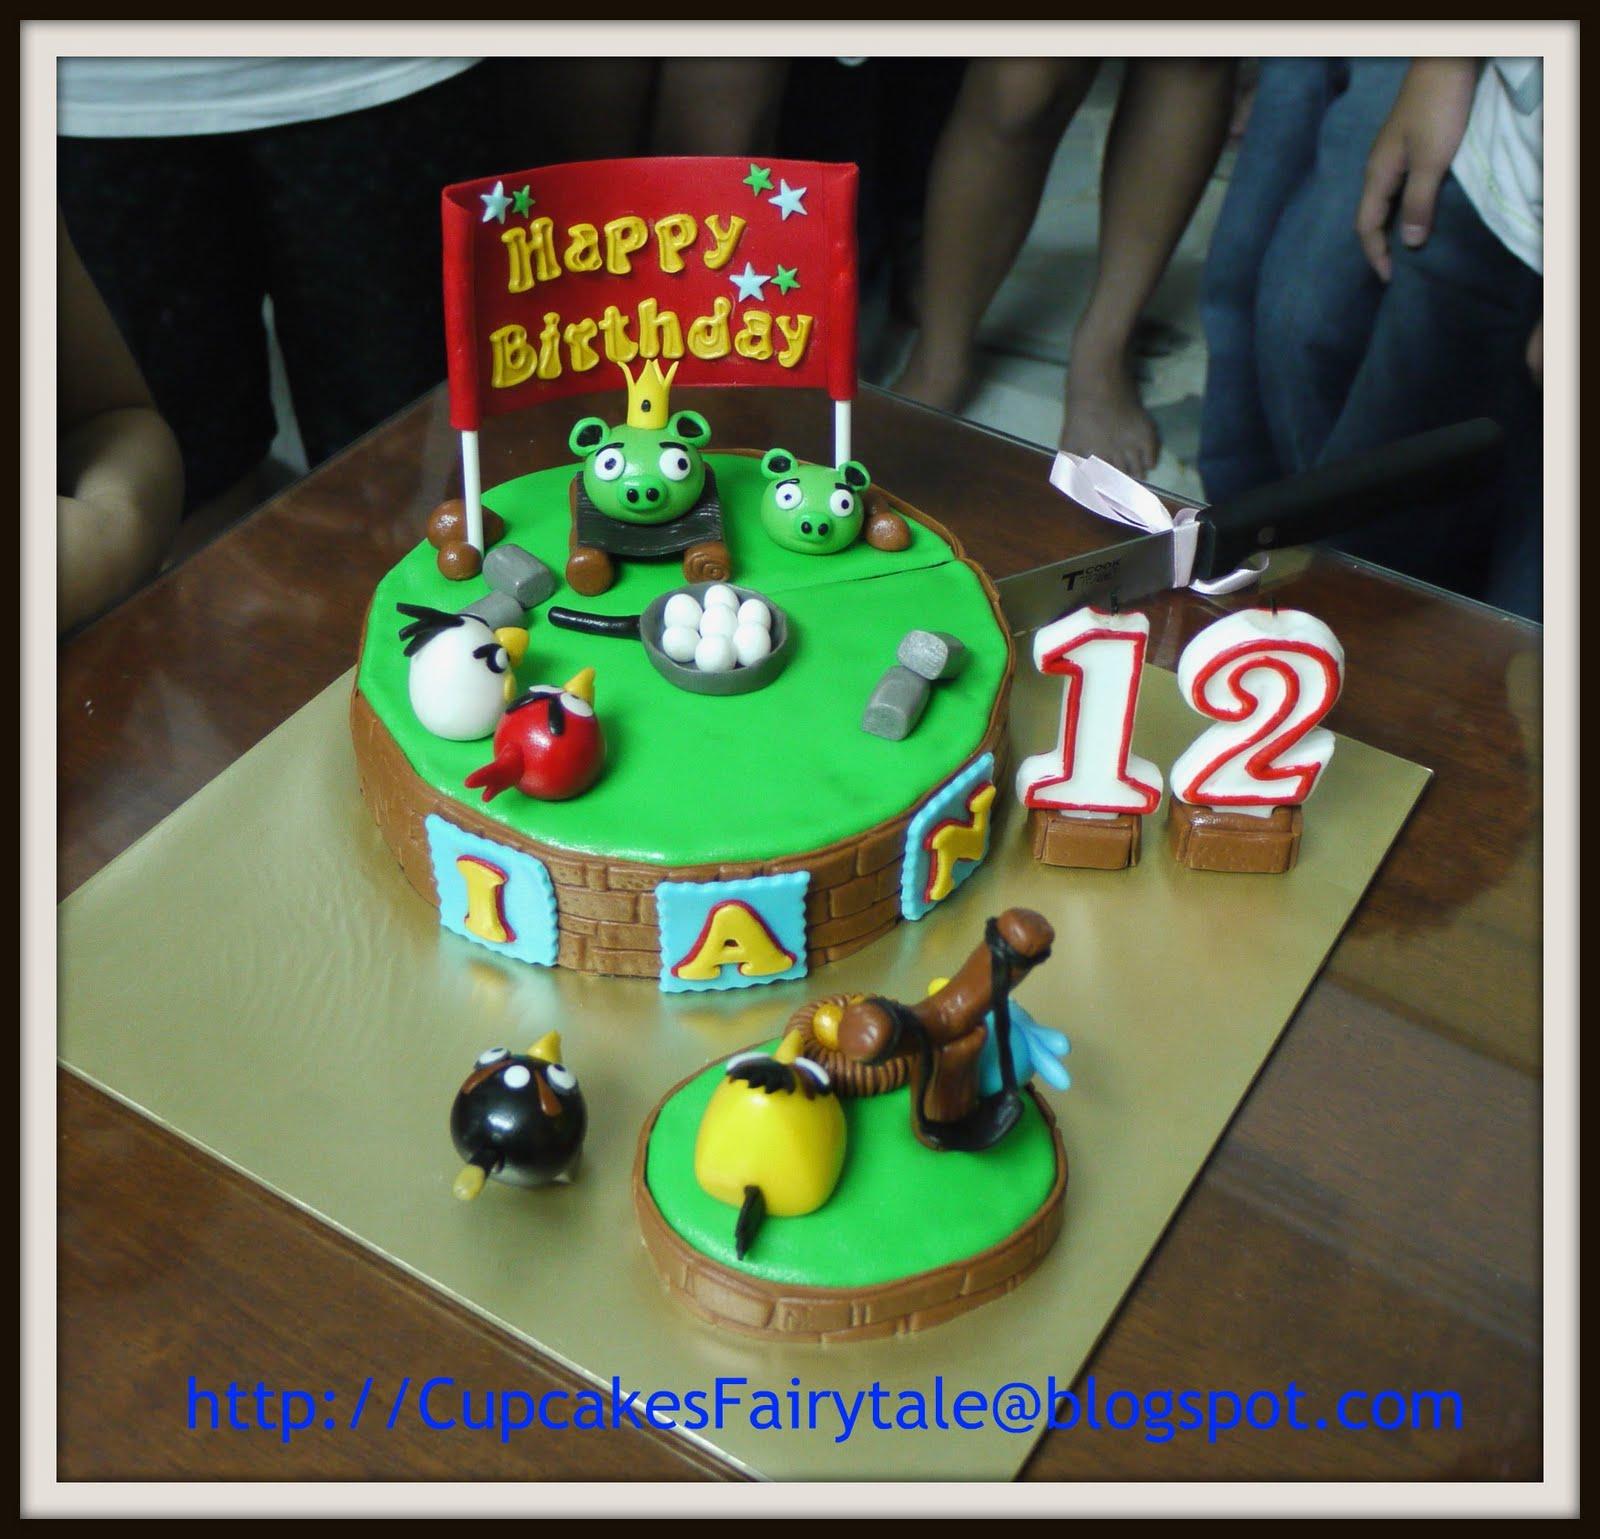 Cupcakes Fairytale Ians 12th Birthday Cake Cupcakes Angry